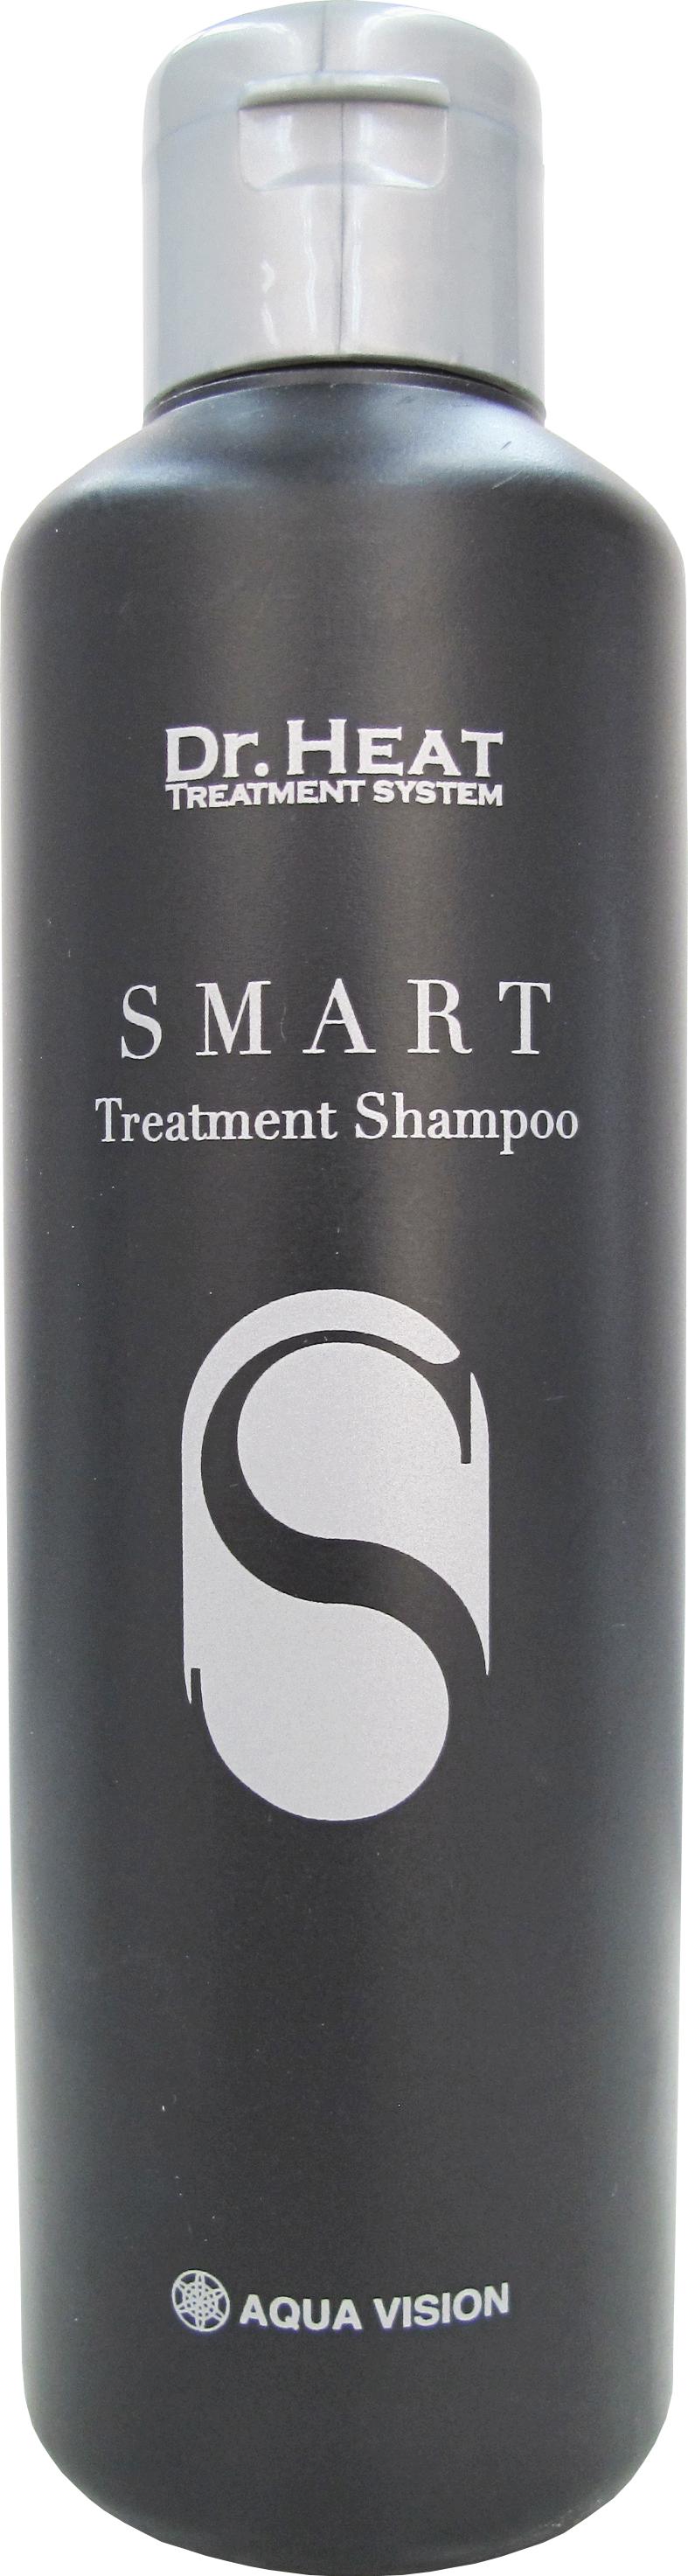 SMARTトリートメント シャンプー